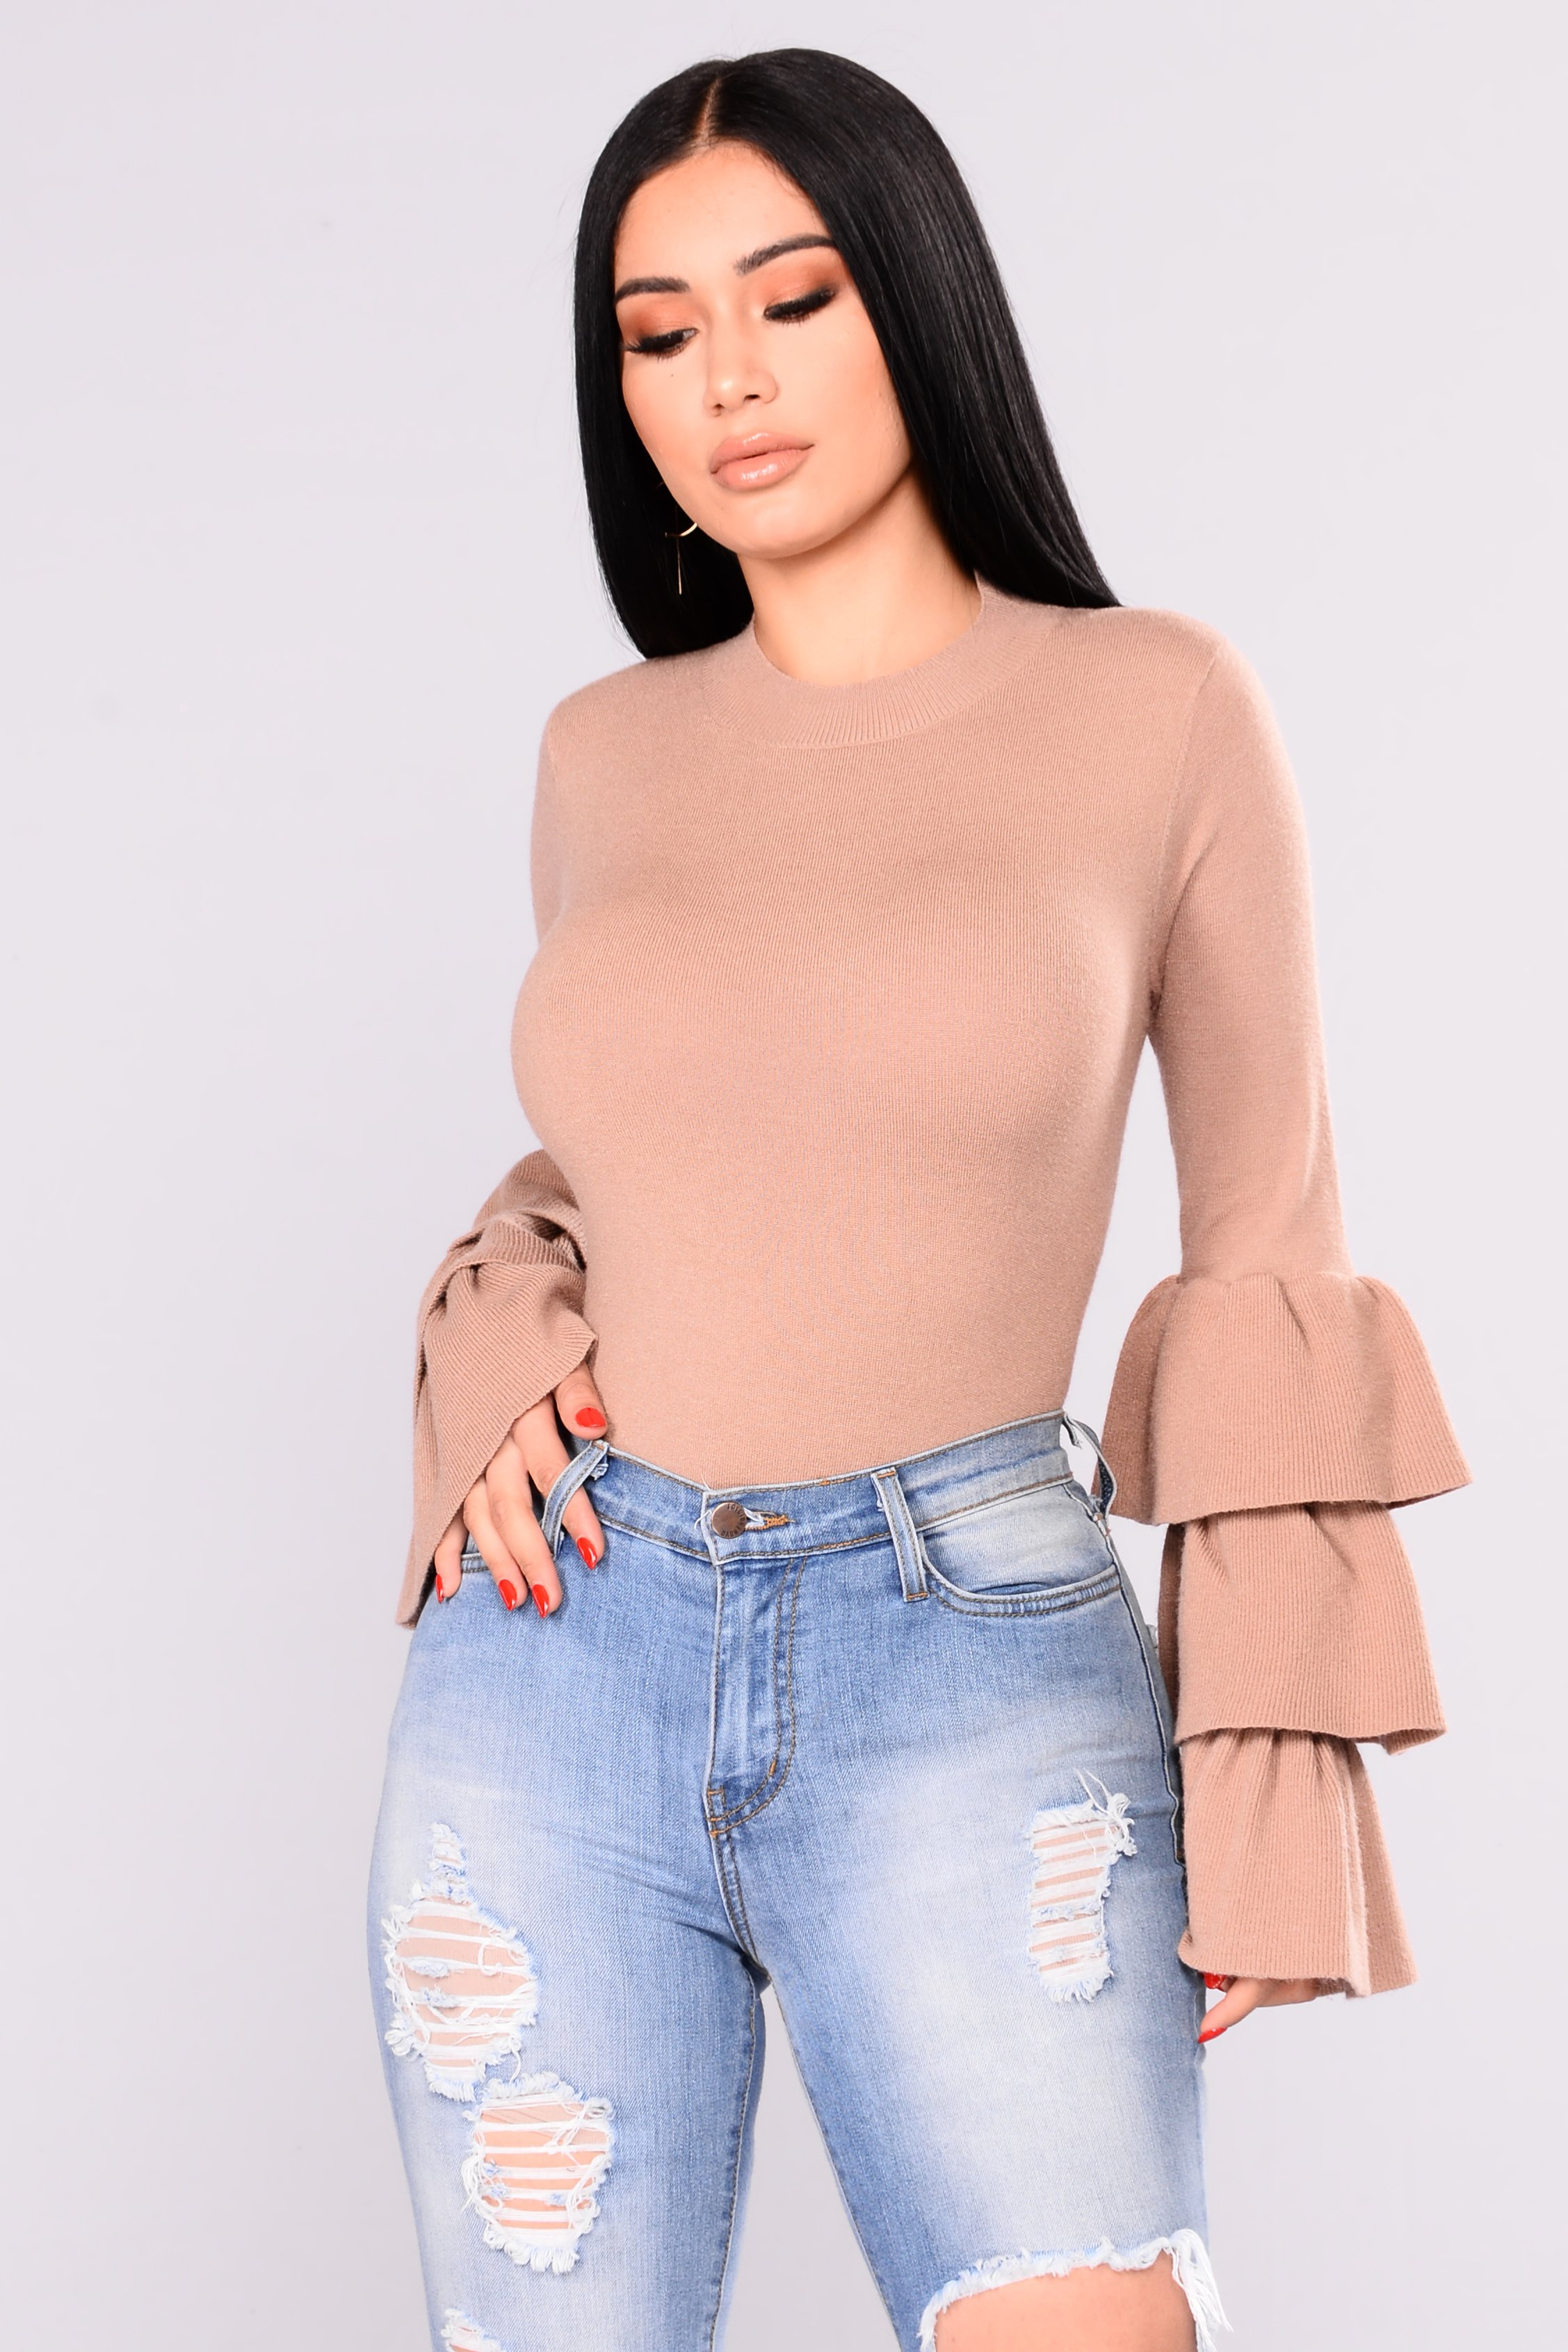 51ad4058410 I Tried Fashion Nova Plus Size Clothing   What I Found Was Shocking